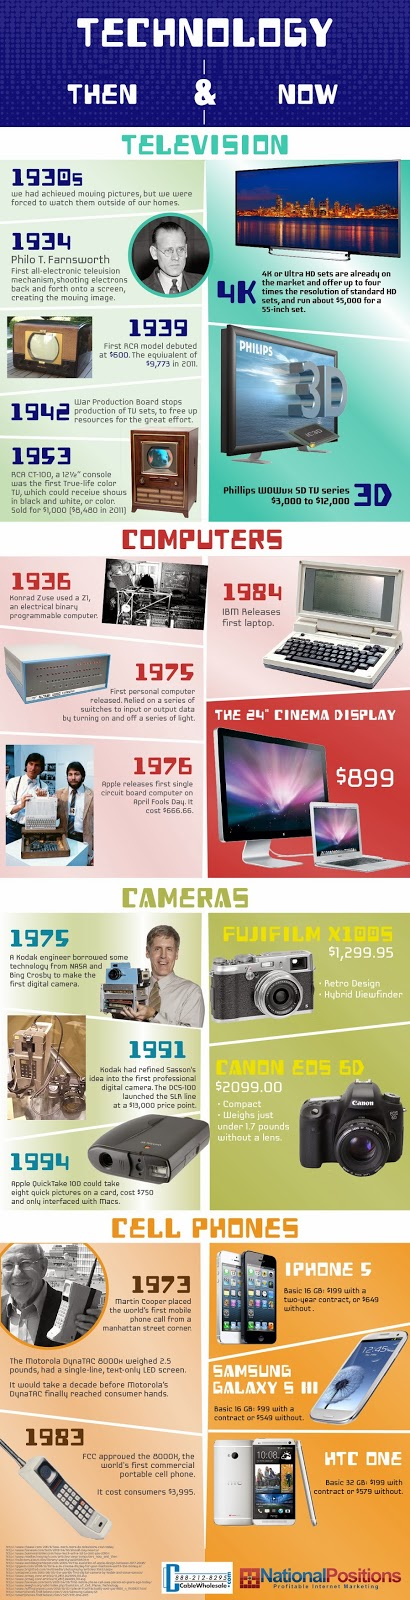 https://files.cablewholesale.com/images/infographics/infographic_wireframe_cablewholesale_aug2013_lrg.jpg